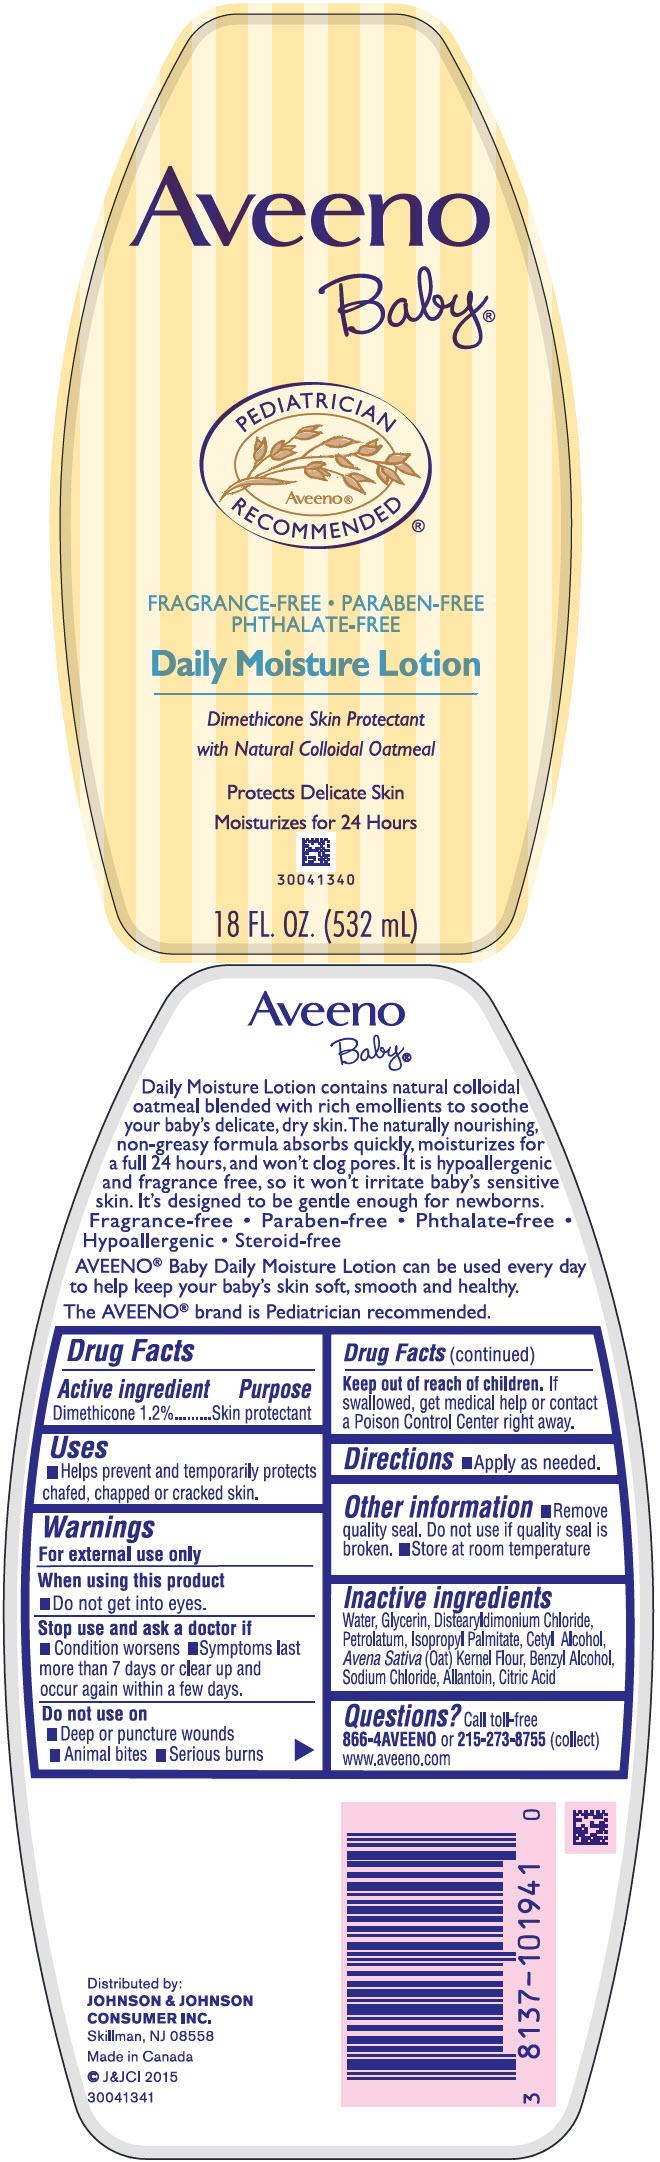 PRINCIPAL DISPLAY PANEL - 532 mL Bottle Label